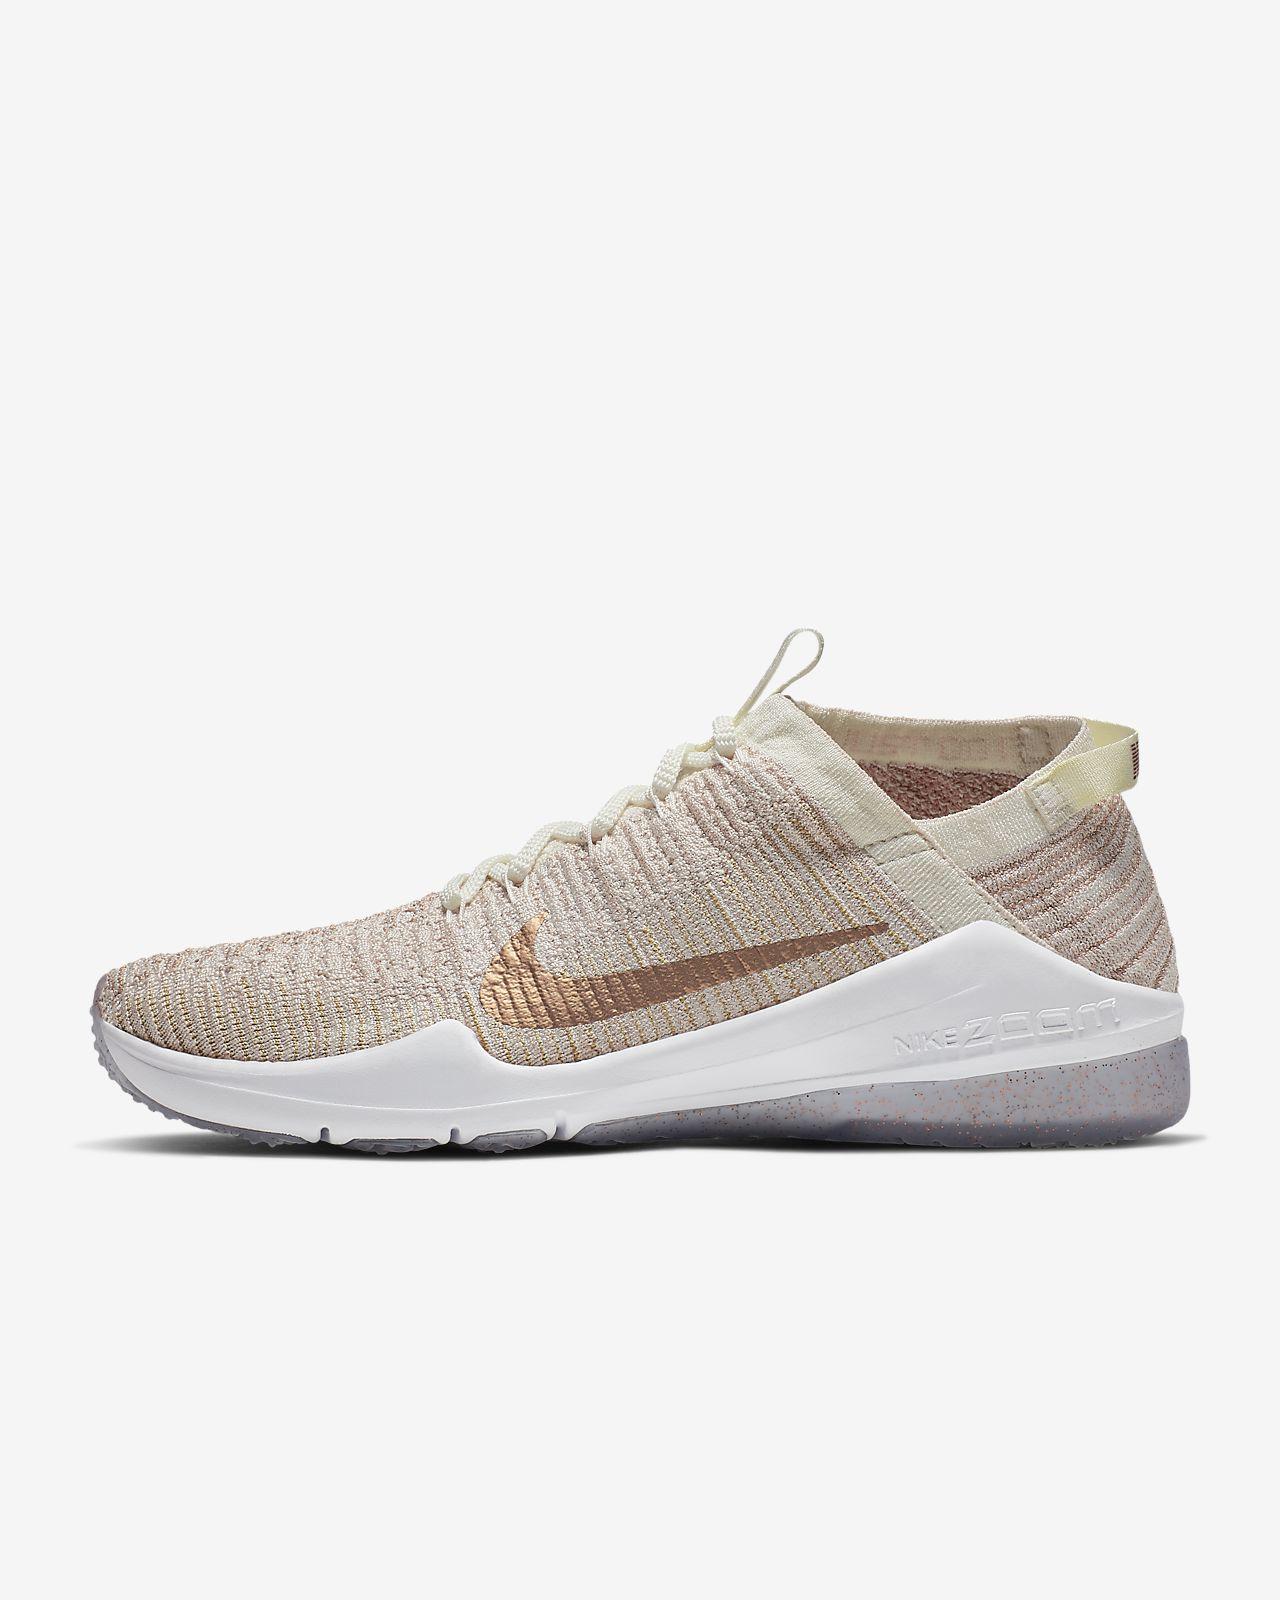 Nike Air Zoom Fearless Flyknit 2 Metallic Damen-Trainingsschuh